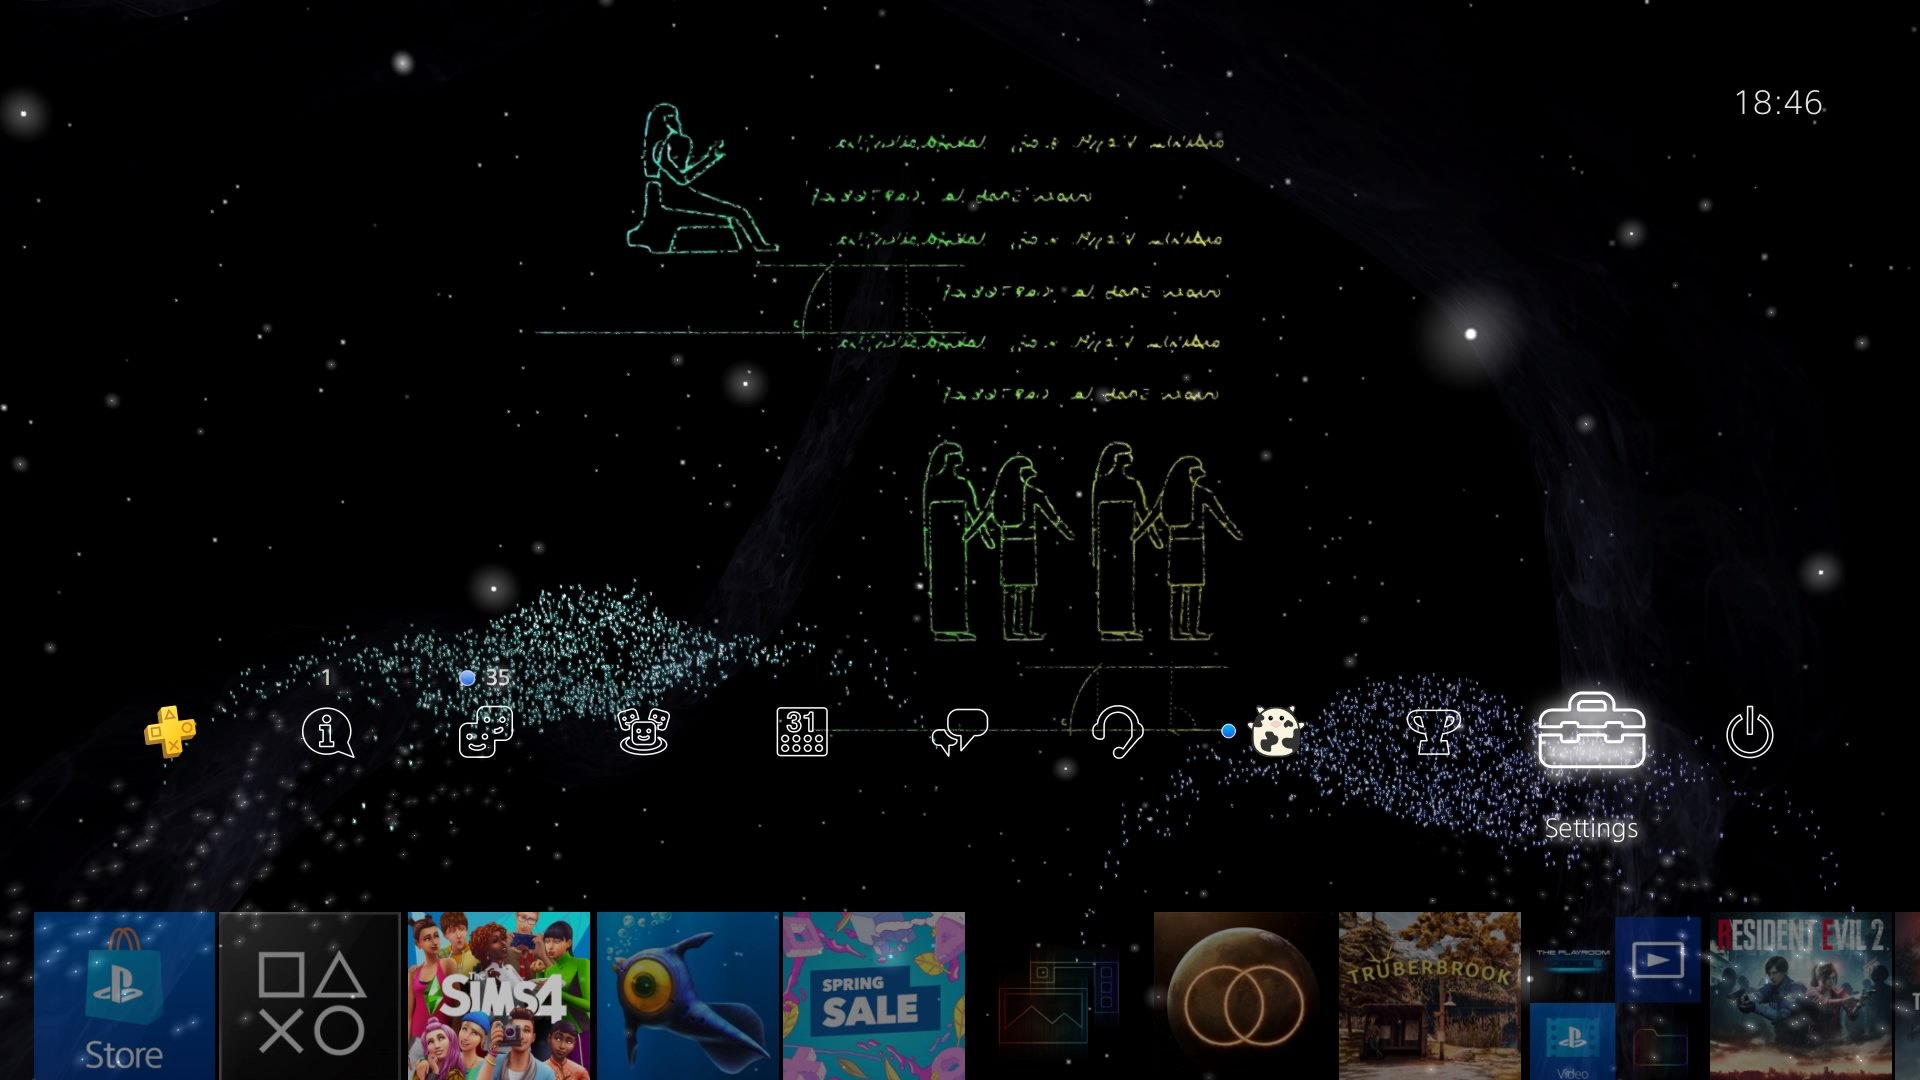 tetris effect metamorphosis theme.original - PlayStation 4 - Guida: i migliori temi gratuiti da scaricare